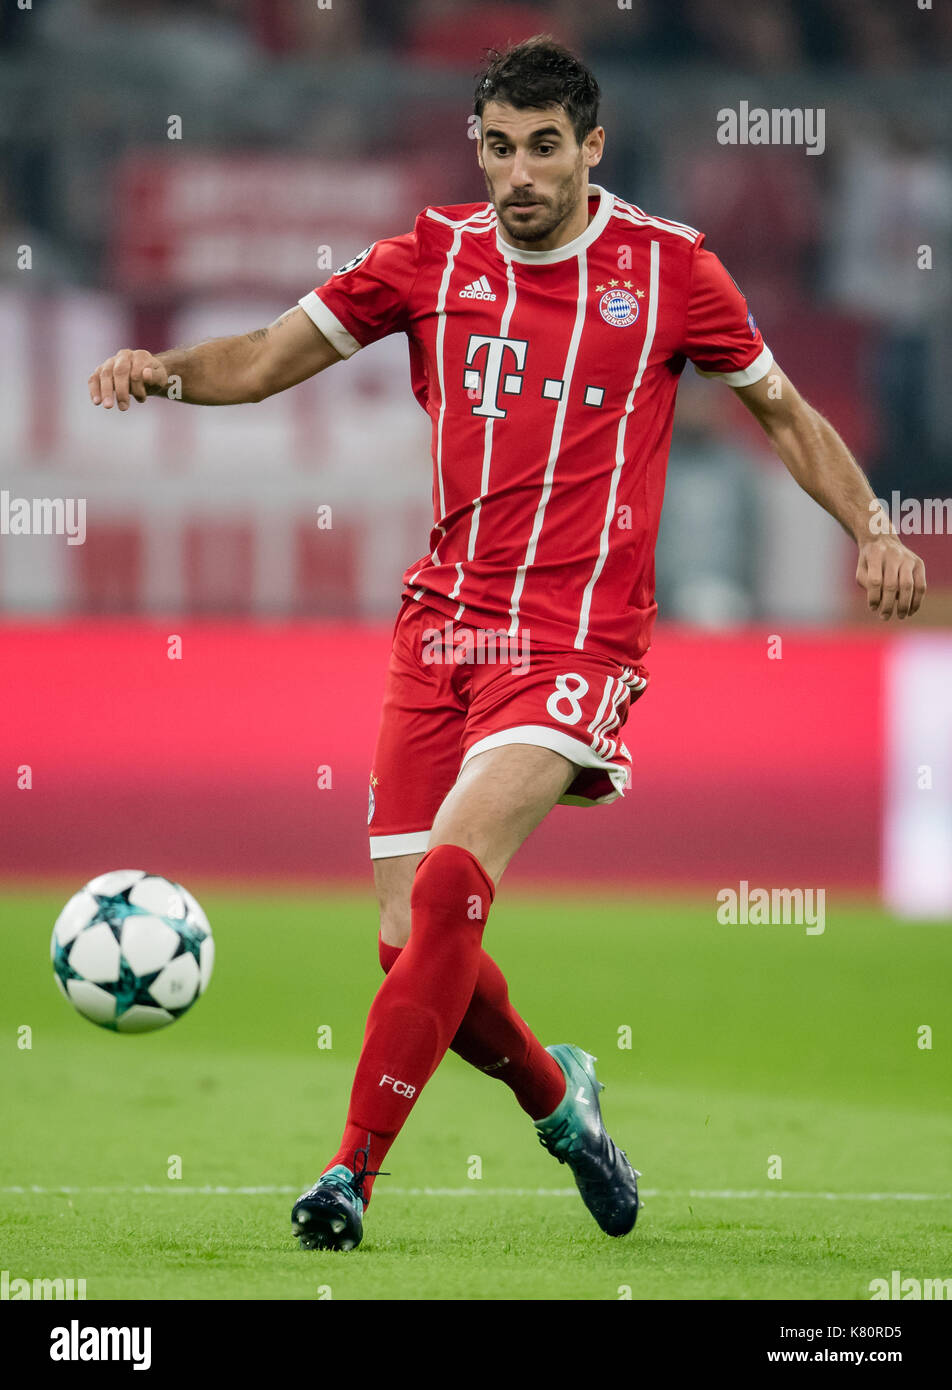 Munich Germany 13th Sep 2017 Munich s Javi Martinez in action